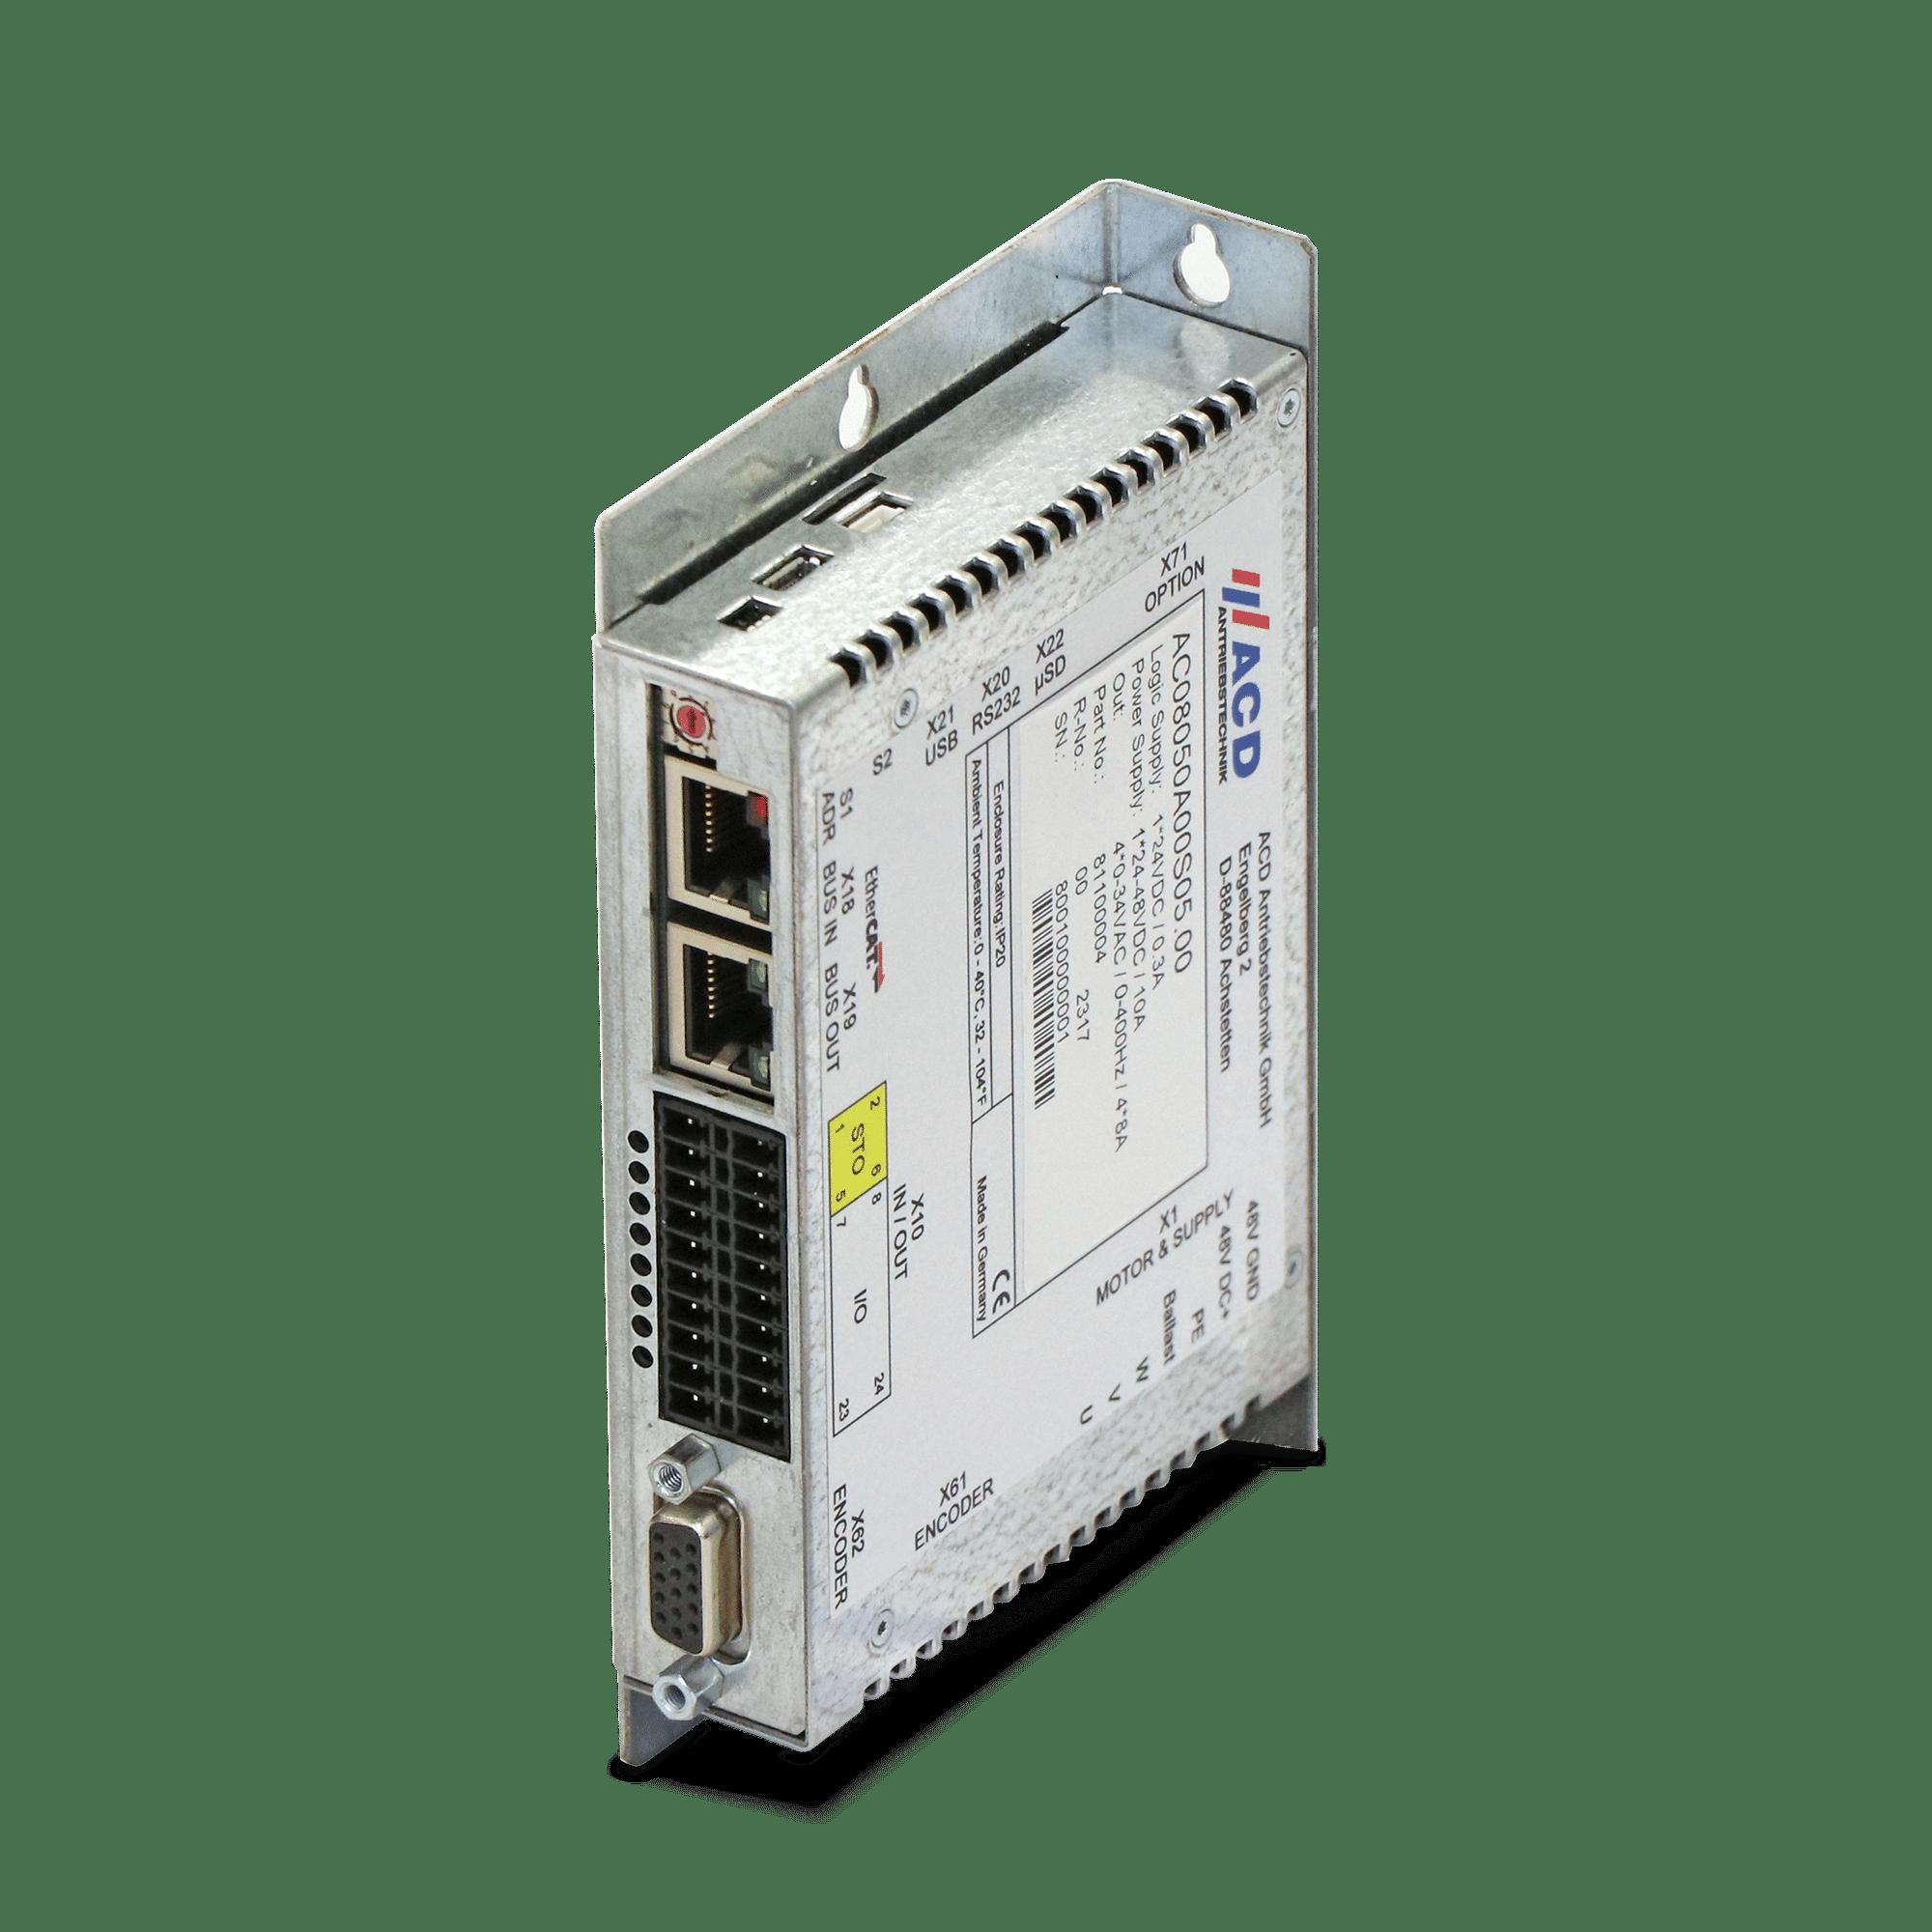 Drive Controller ACxx070A00S05